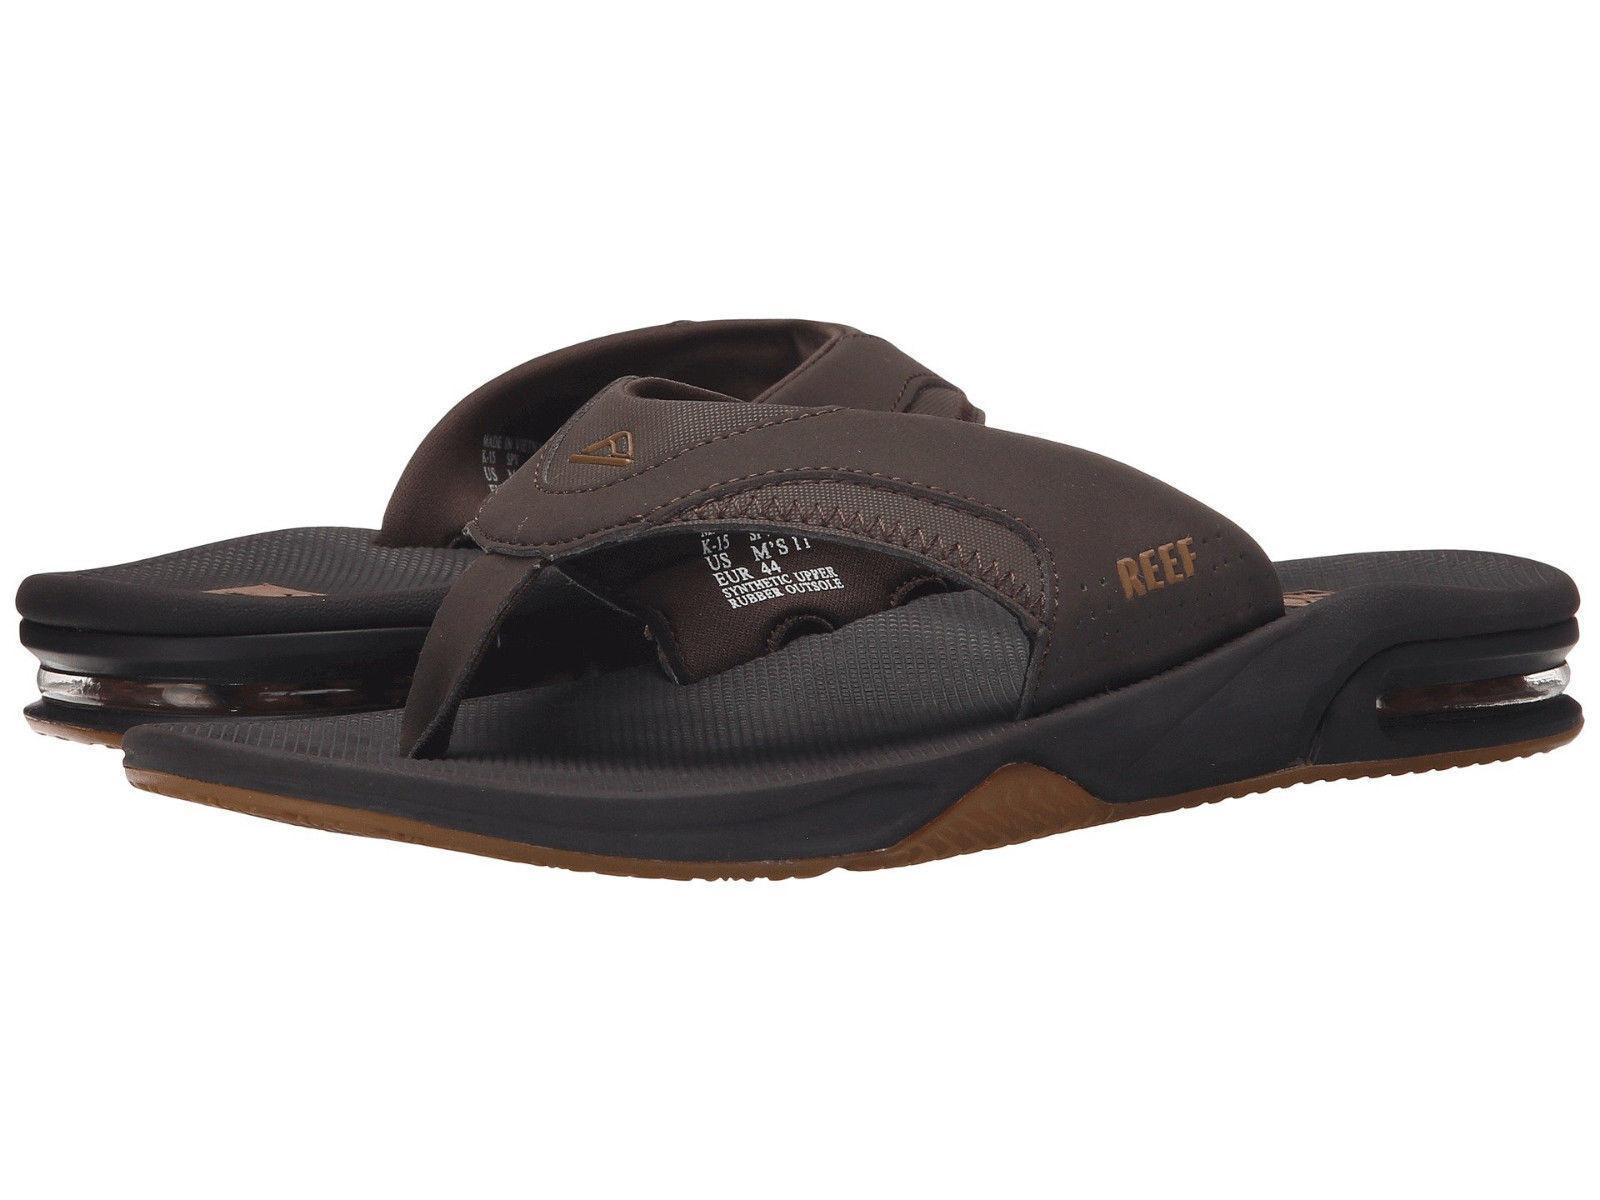 New Reef Men's FANNING LOW Bottle Opener Flip Flop Sandal Thong RF002026 Brown